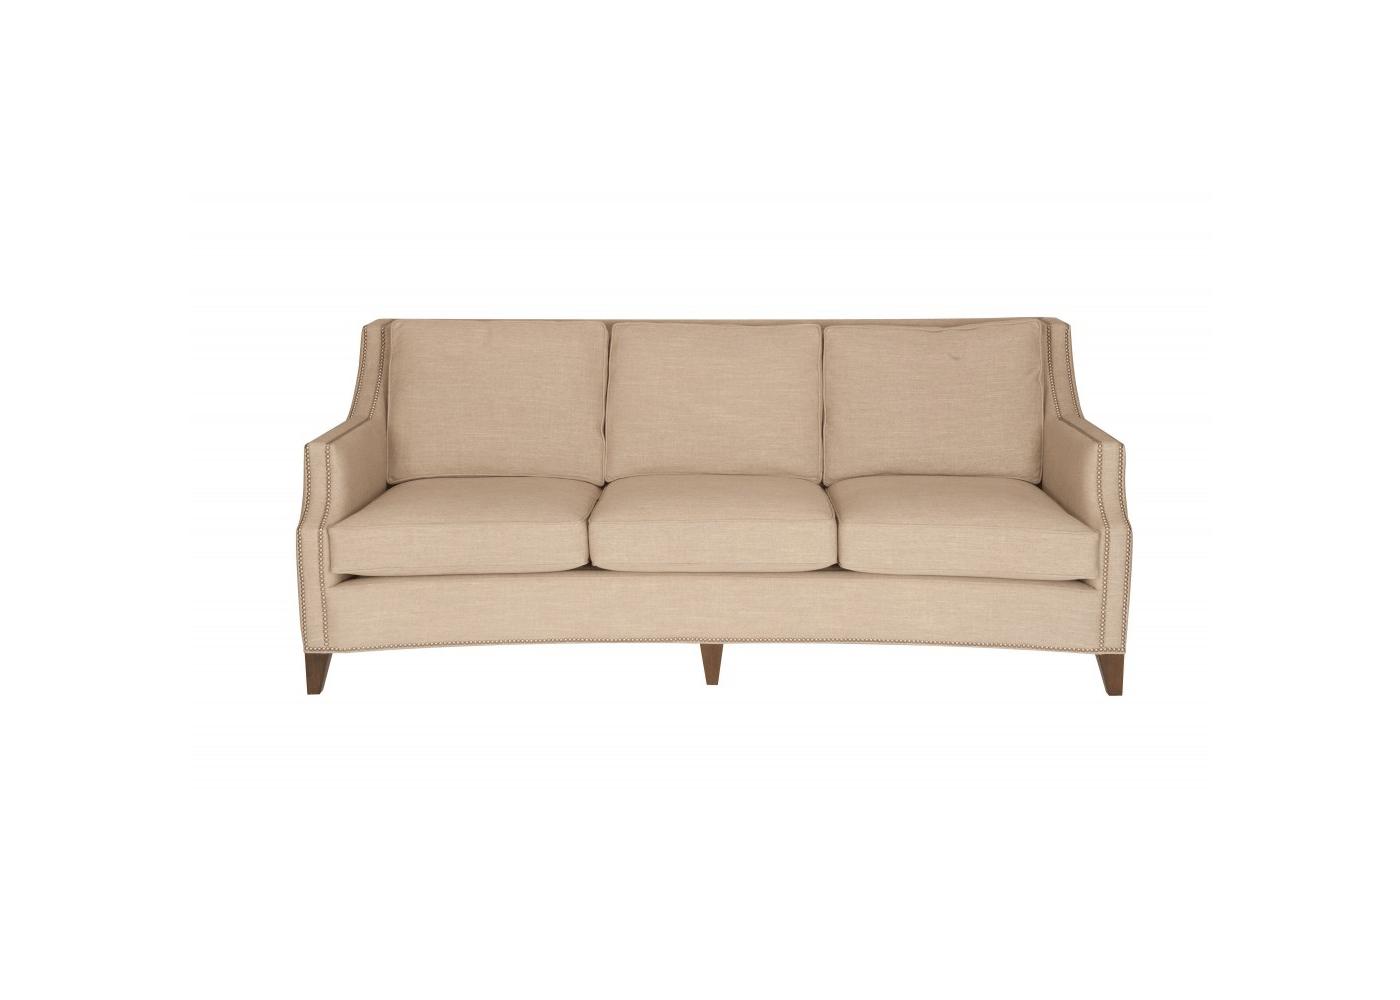 diamond sofa dolce plush sofas clearance polanco furniture store ottawa interior decor solutions